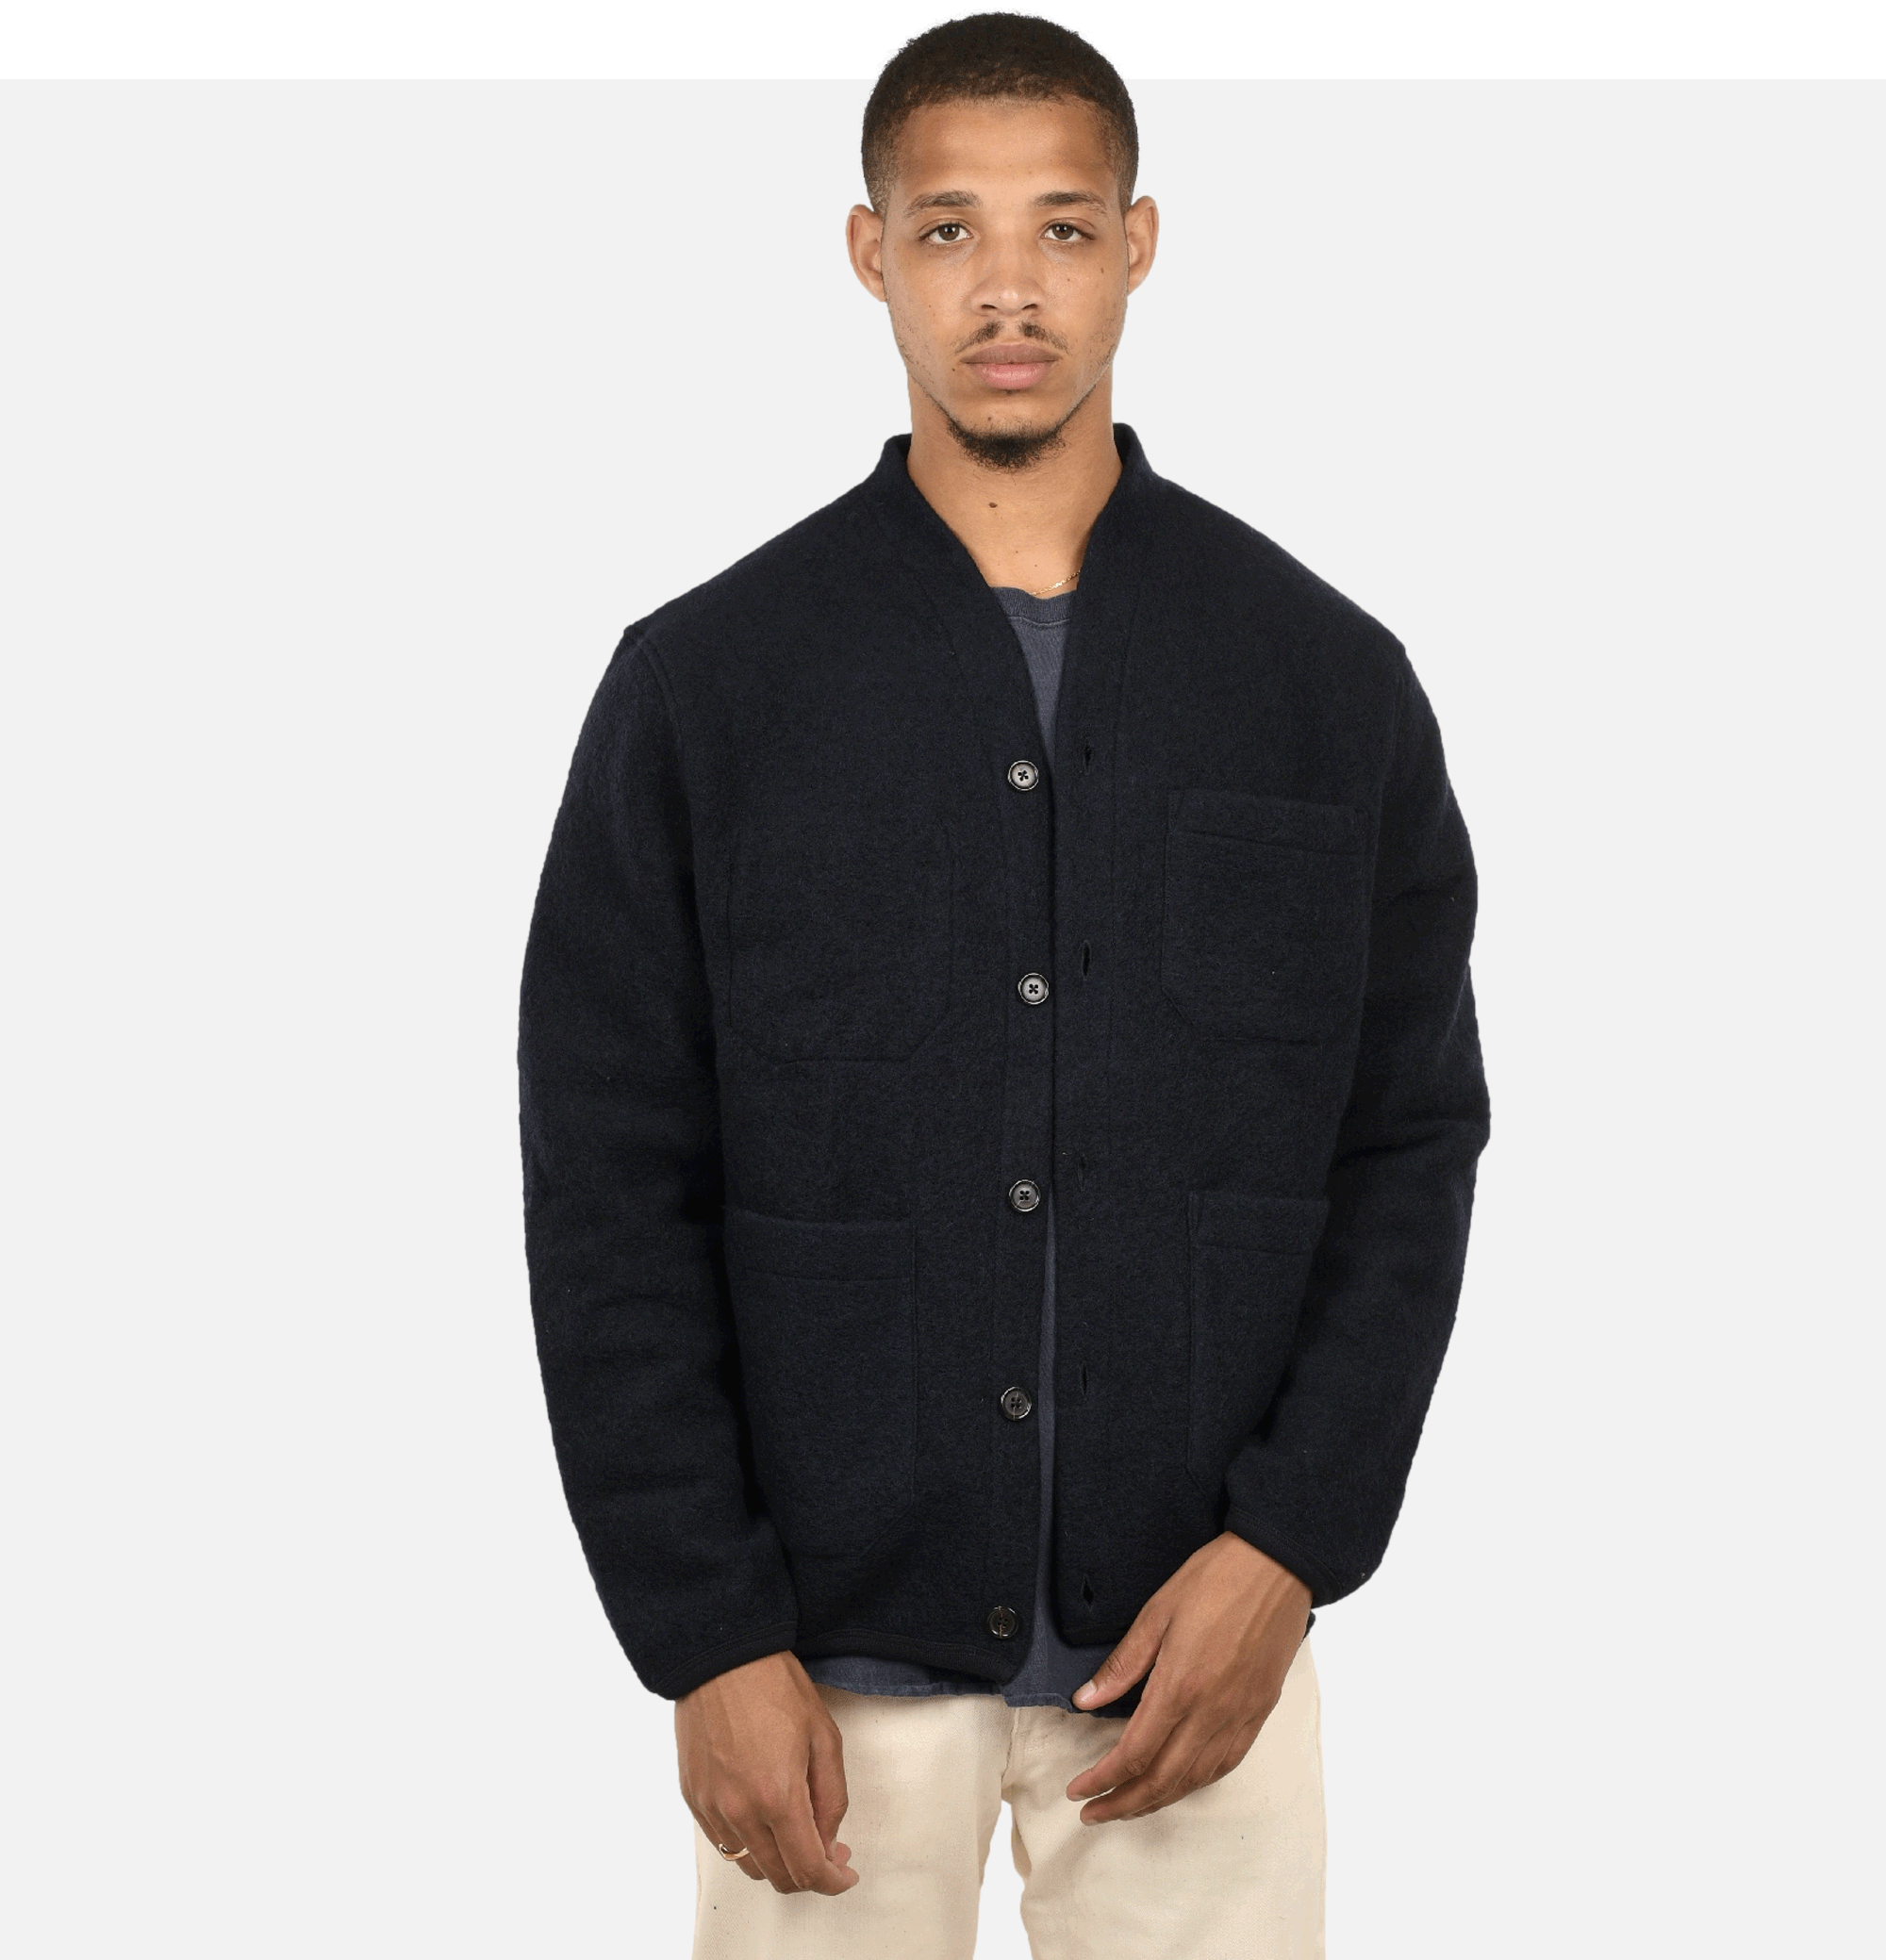 Cardigan Navy Wool Fleece